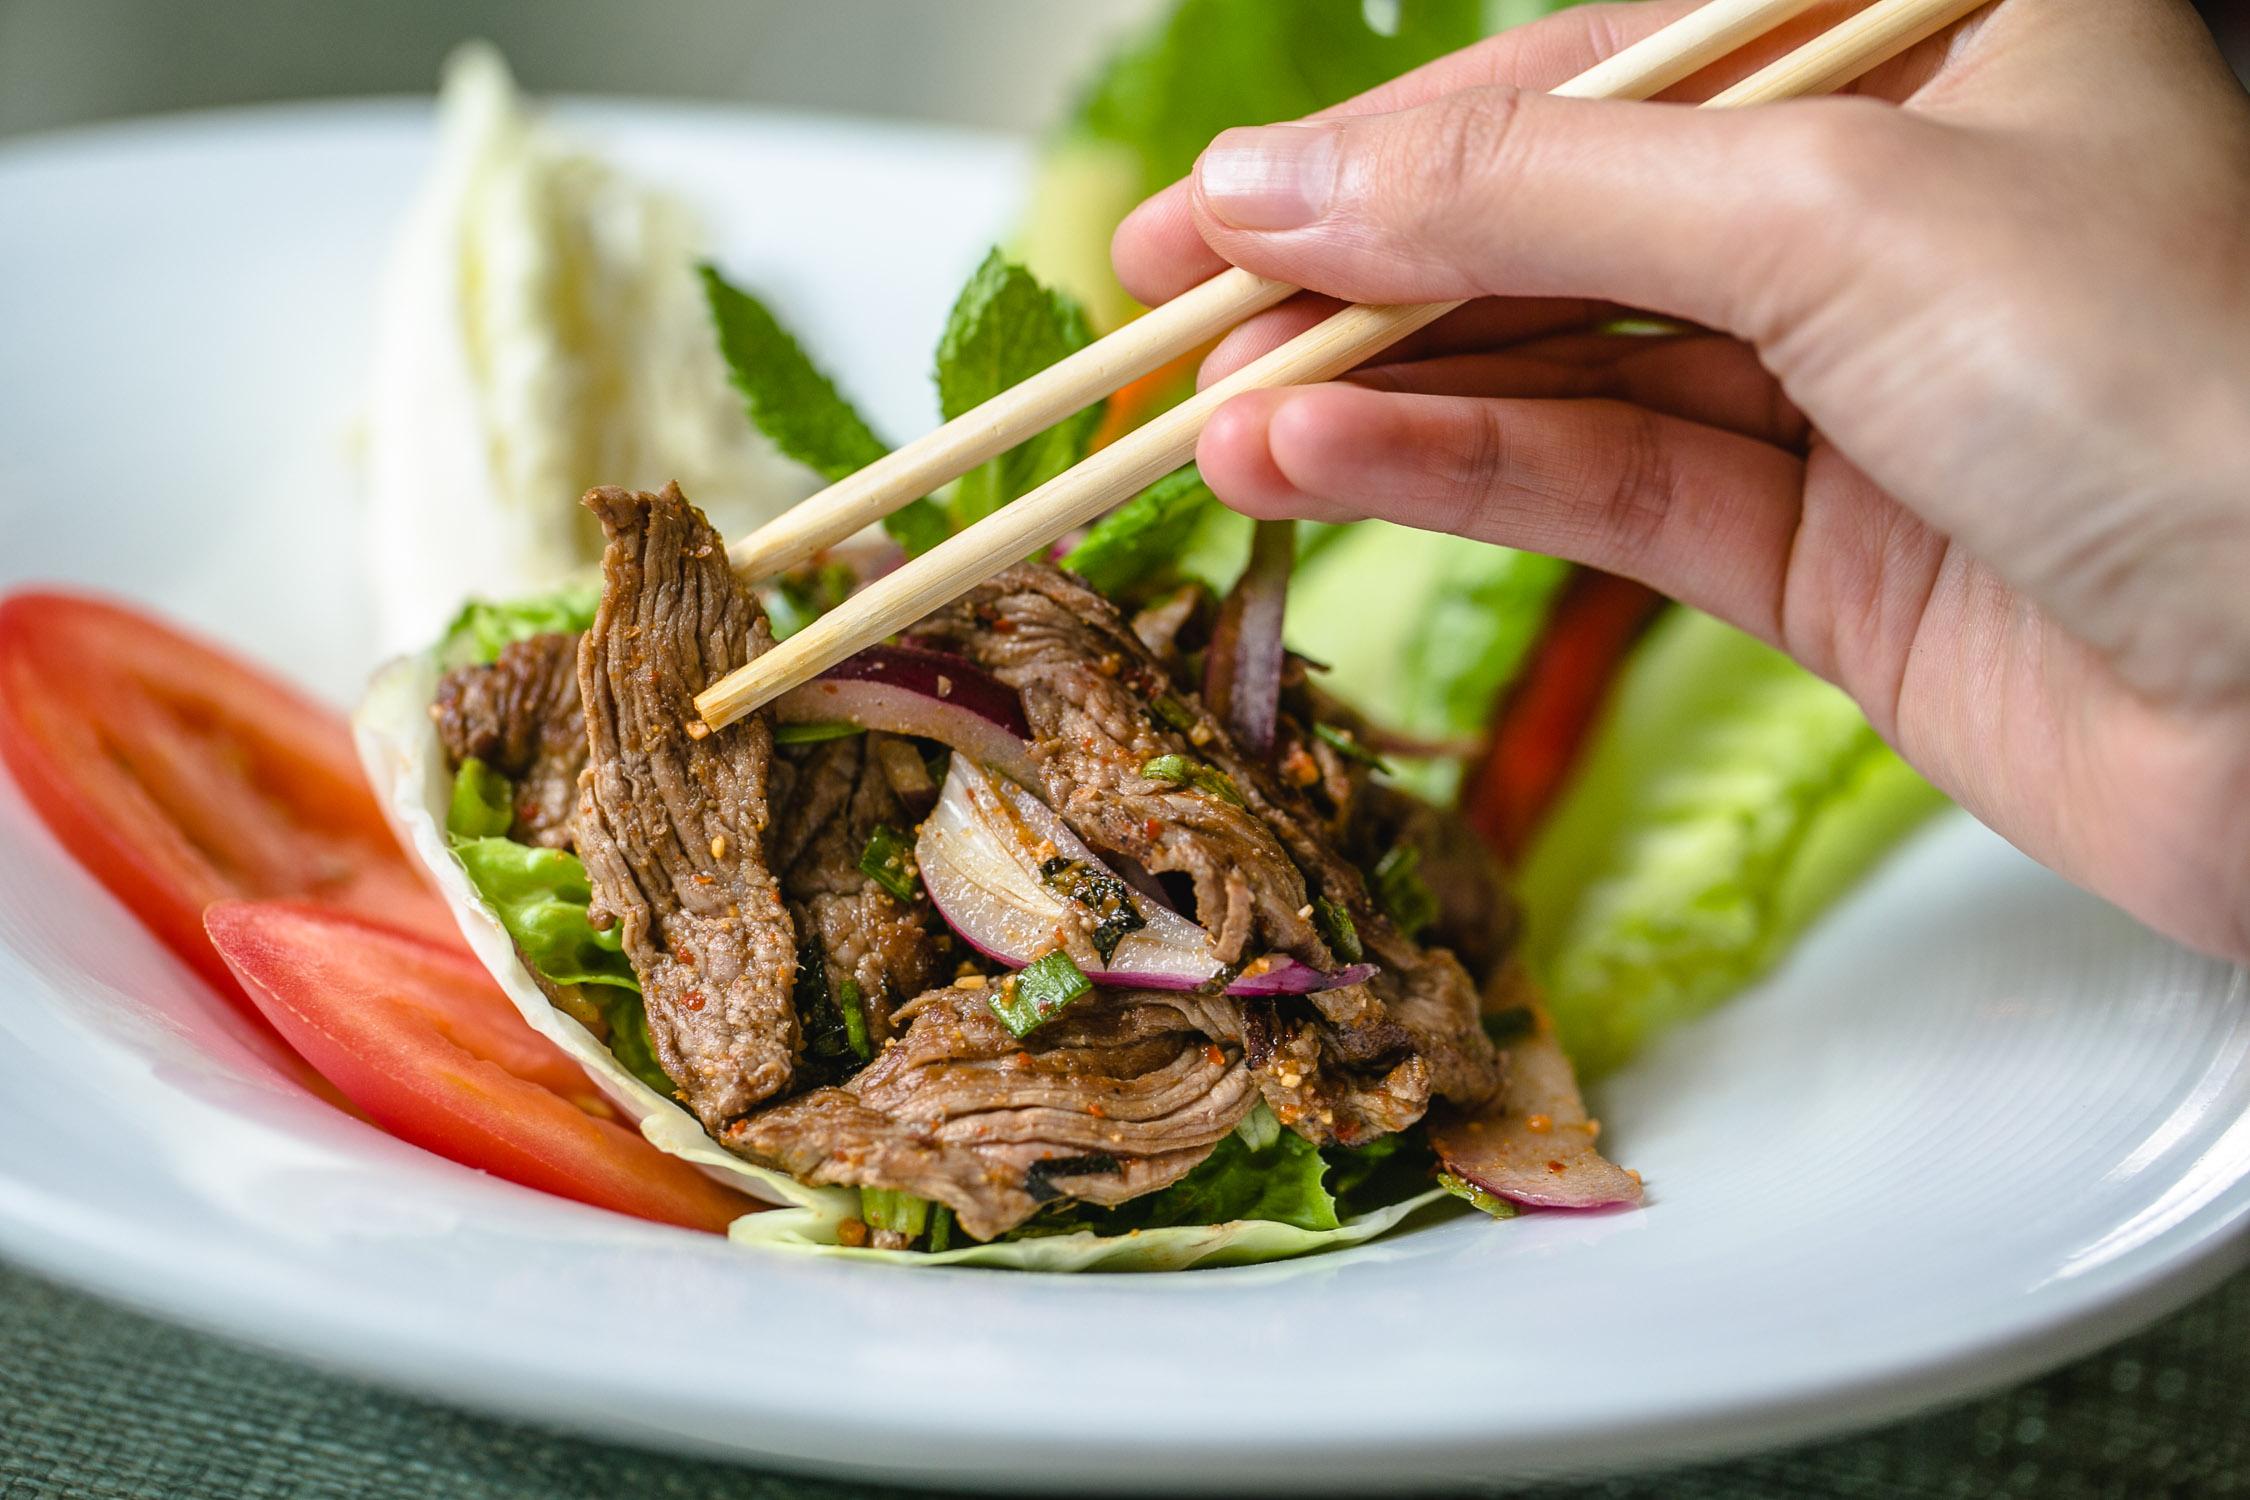 Nan-Thai-Fine-Dining-Sald-with-Chopsticks-Erik-Meadows